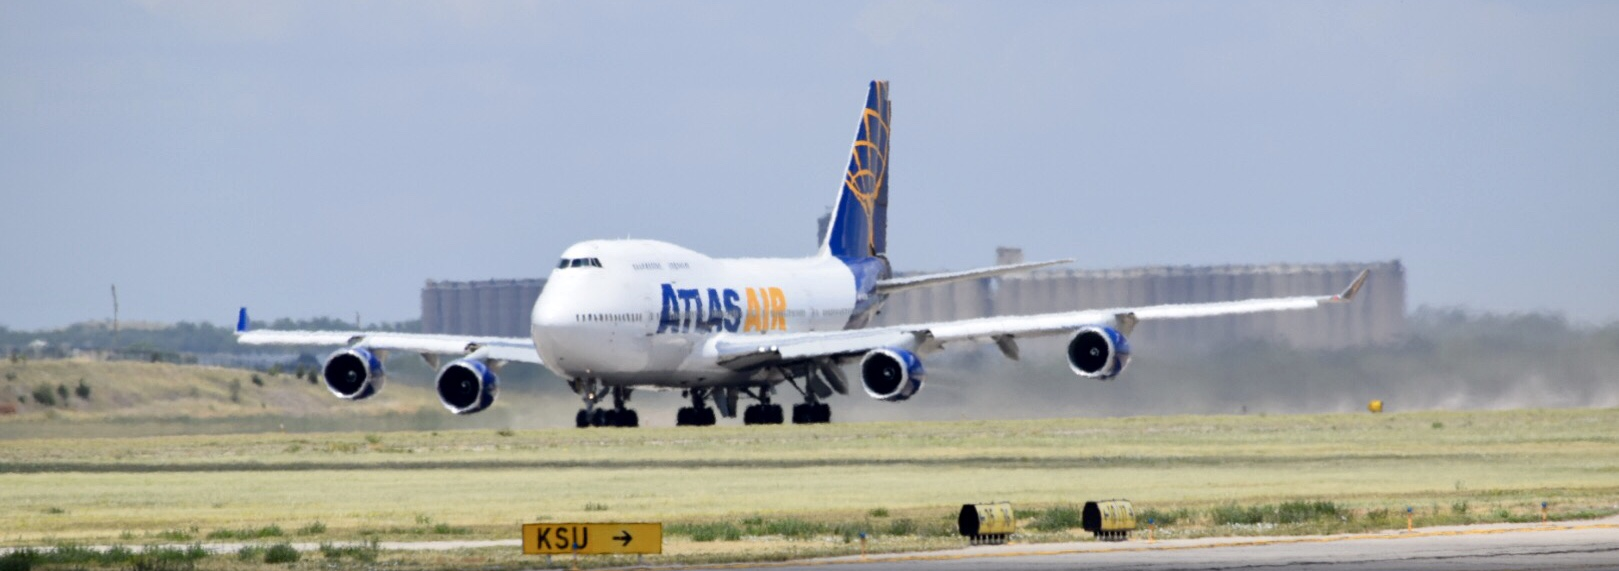 $97 Flights to Salina, Kansas - TripAdvisor